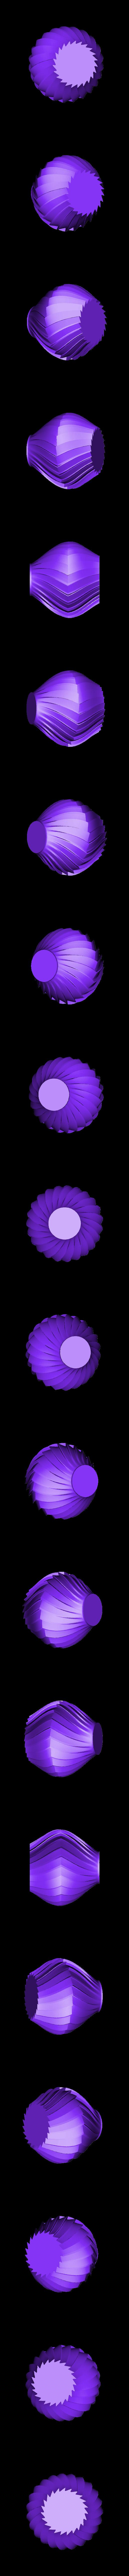 BuzzsawVase.stl Download free STL file Buzzsaw Vases • Model to 3D print, Revalia6D